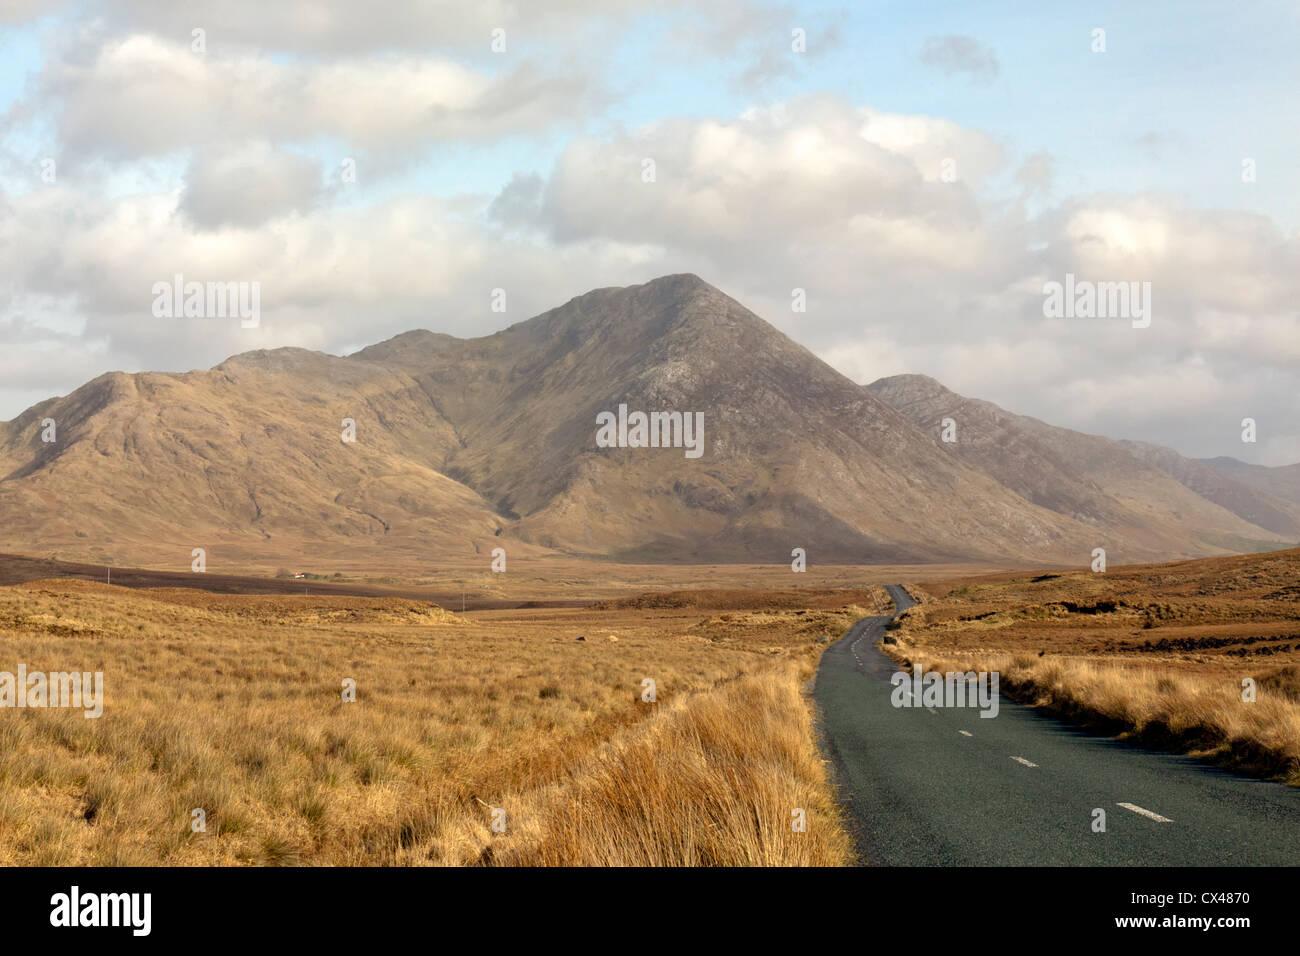 The Twelve Bens, or Twelve Pins (Irish: Na Beanna Beola), is a mountain range located within Connemara National - Stock Image